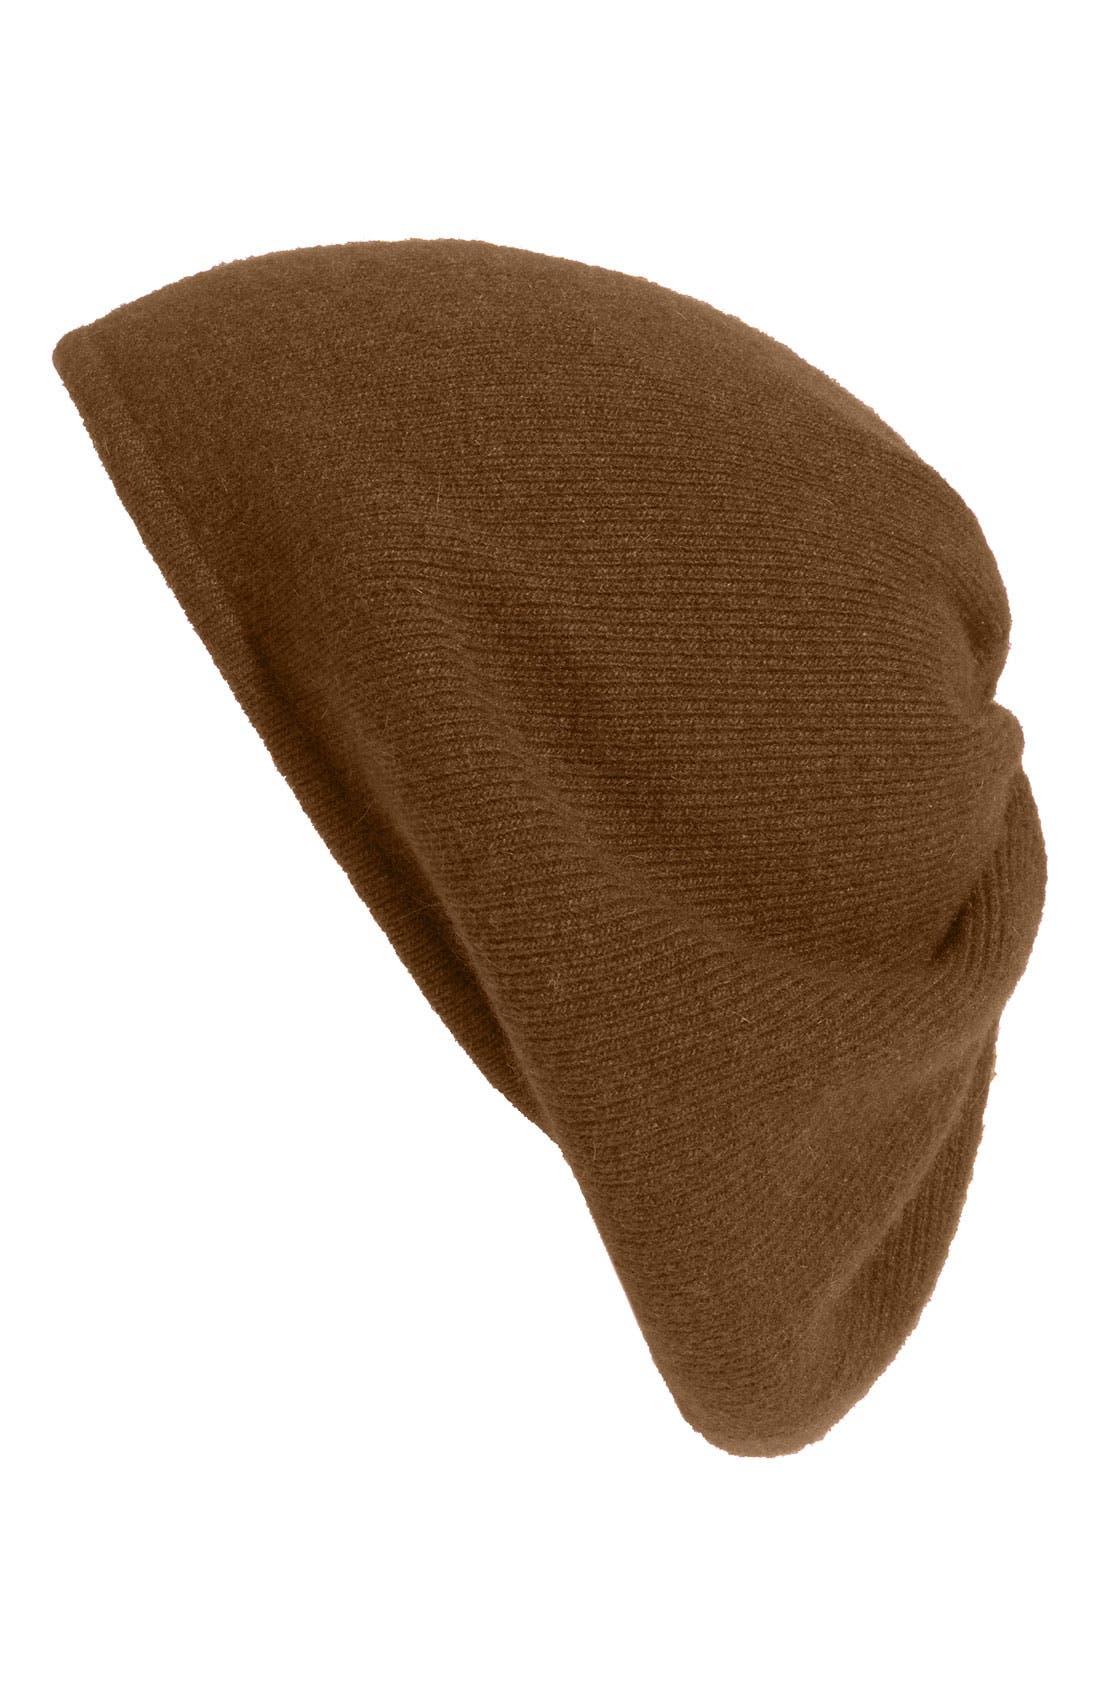 Alternate Image 1 Selected - Portolano 'Item' Knit Hat